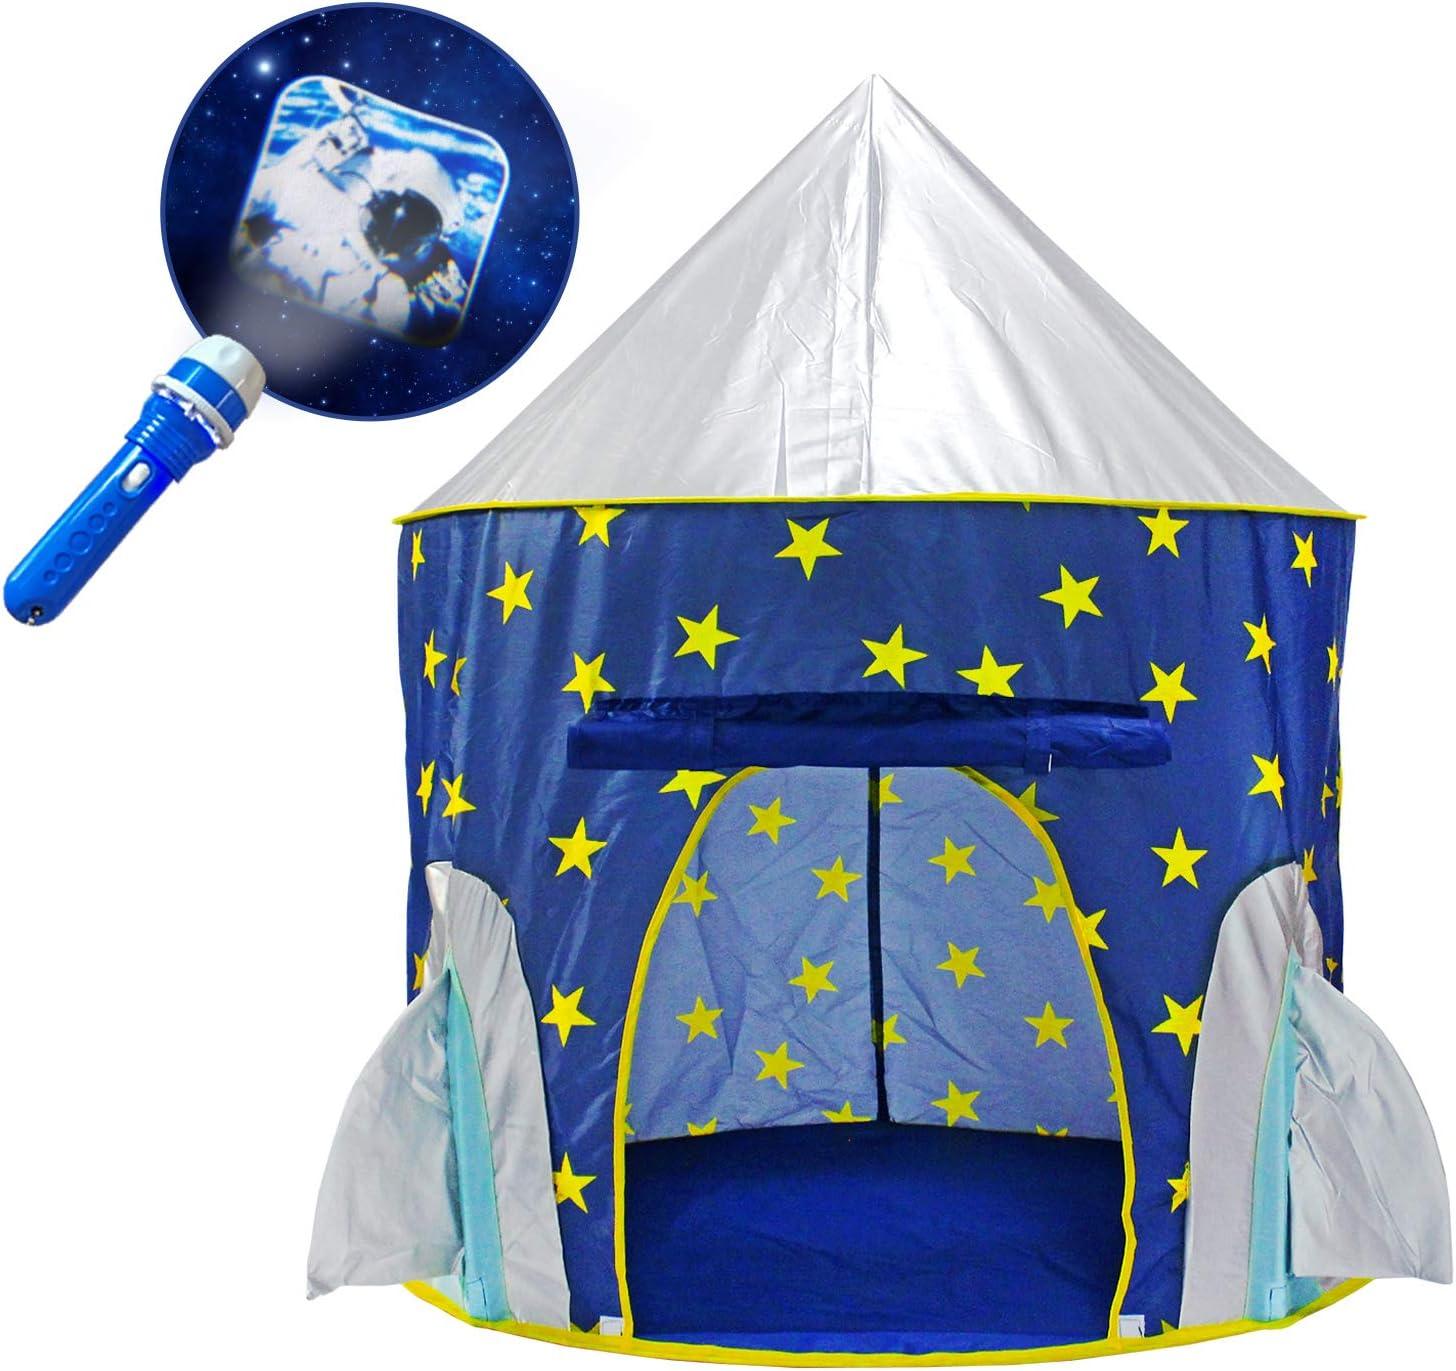 YOOBE Tienda Rocket Ship Play - con BOUNS Space Torch Projector Interior / Exterior Children Playhouse